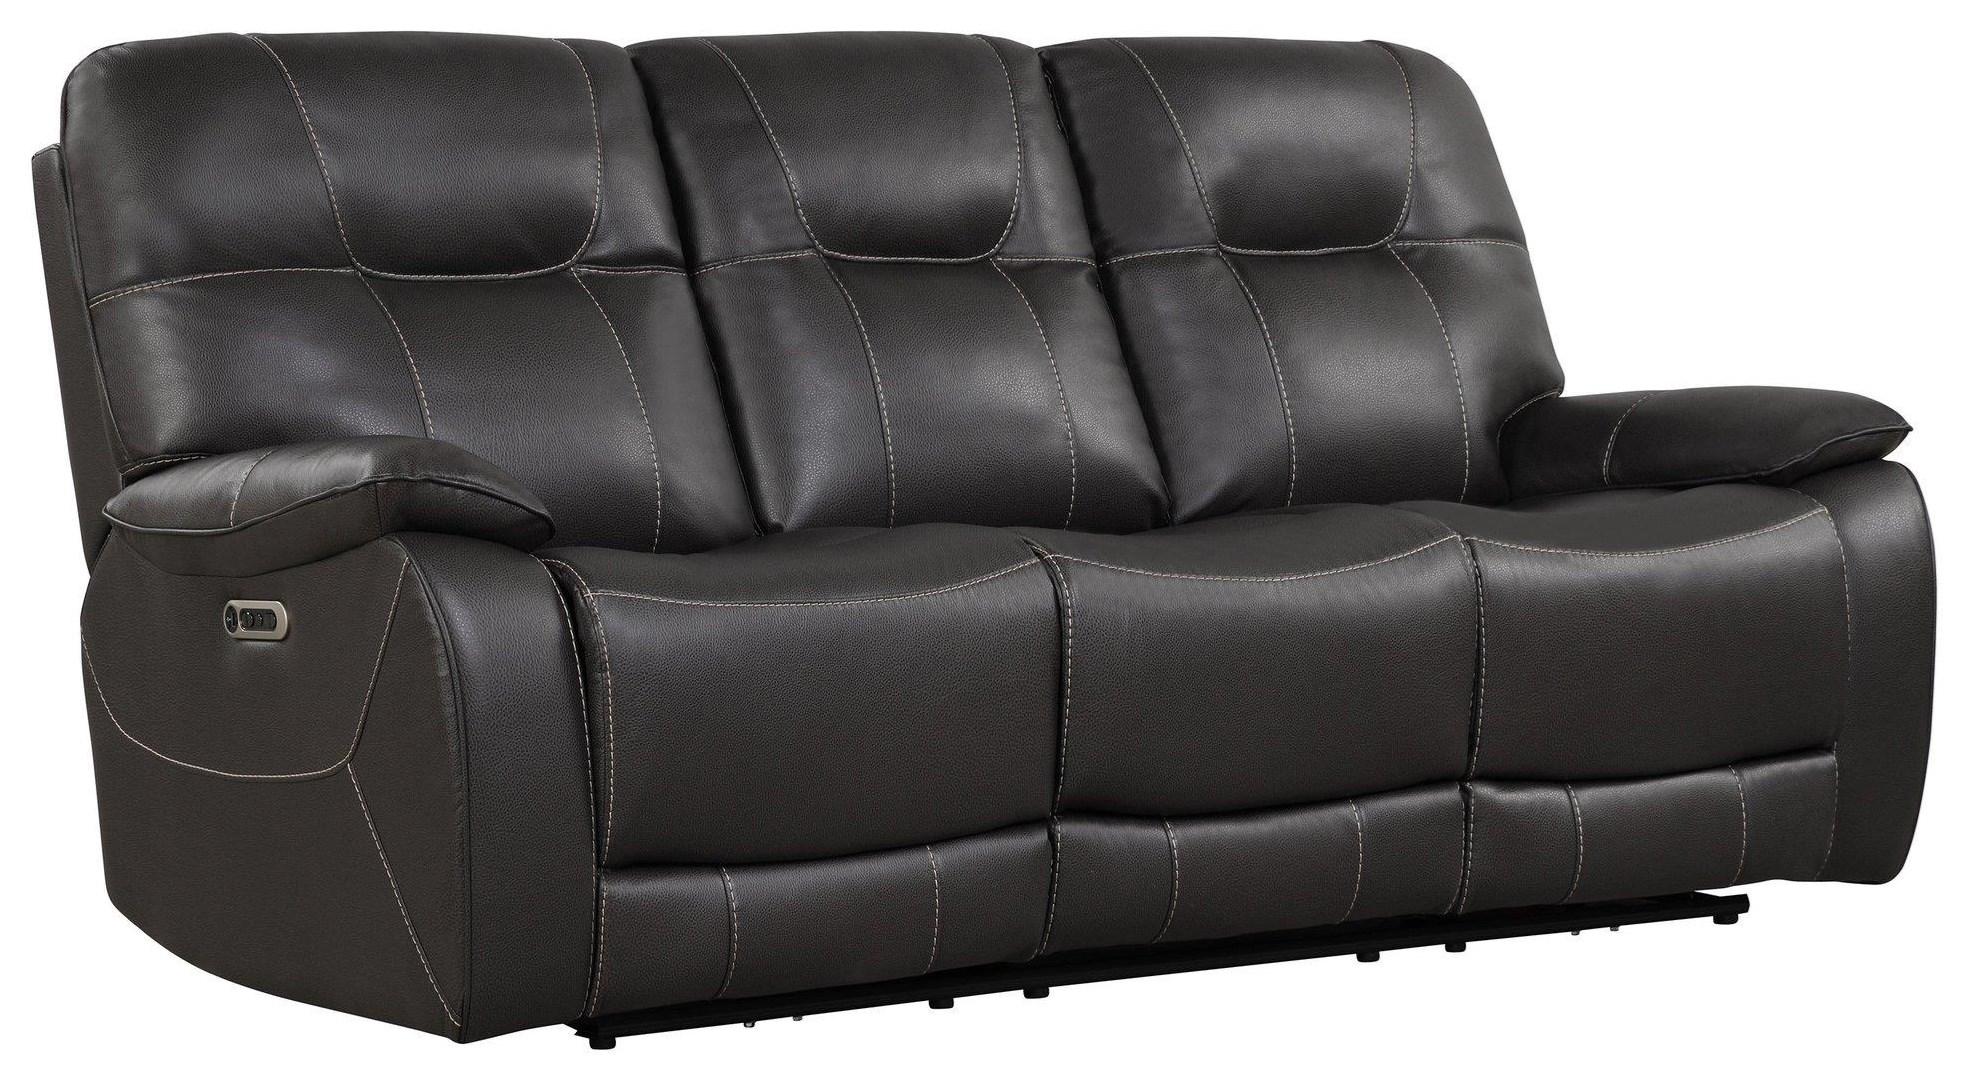 Axel Power Reclining Sofa by Parker House at Johnny Janosik